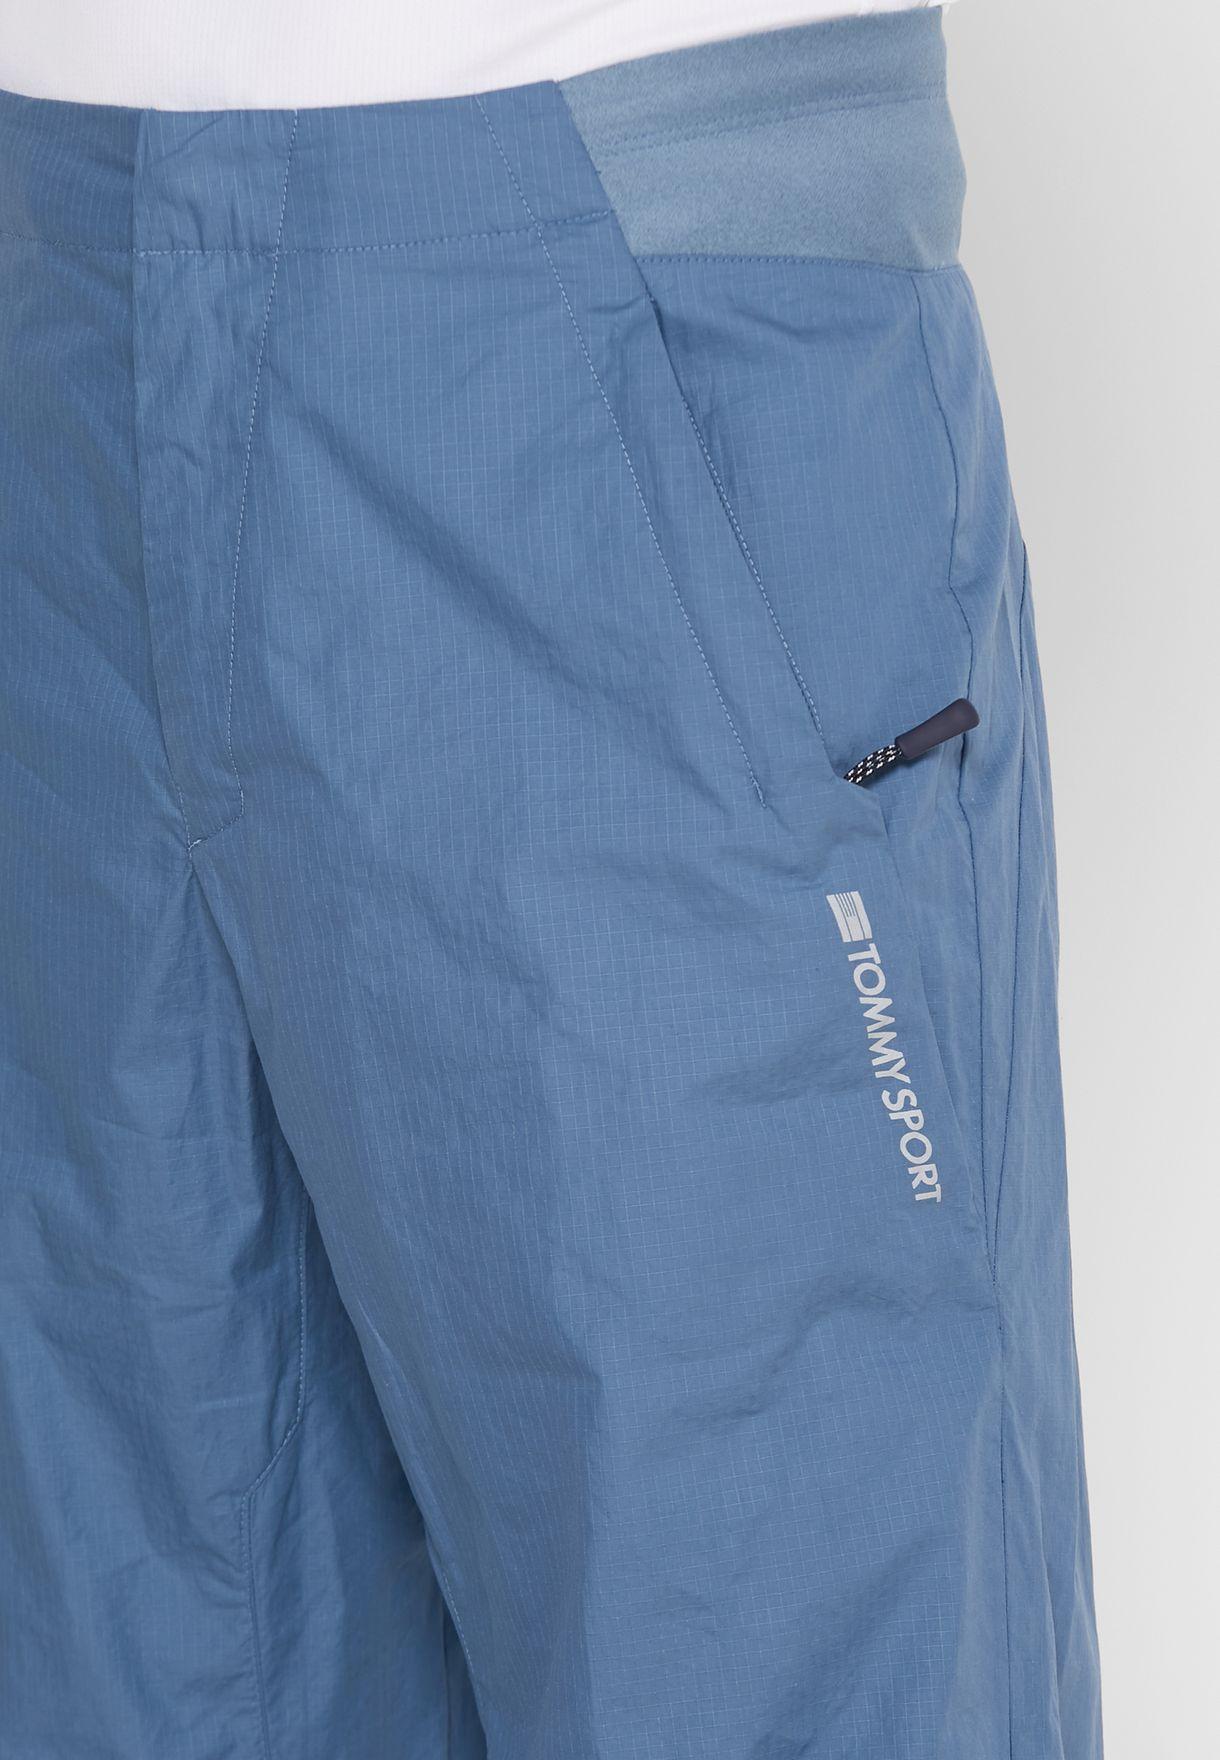 Cottonlab X Sweatpants